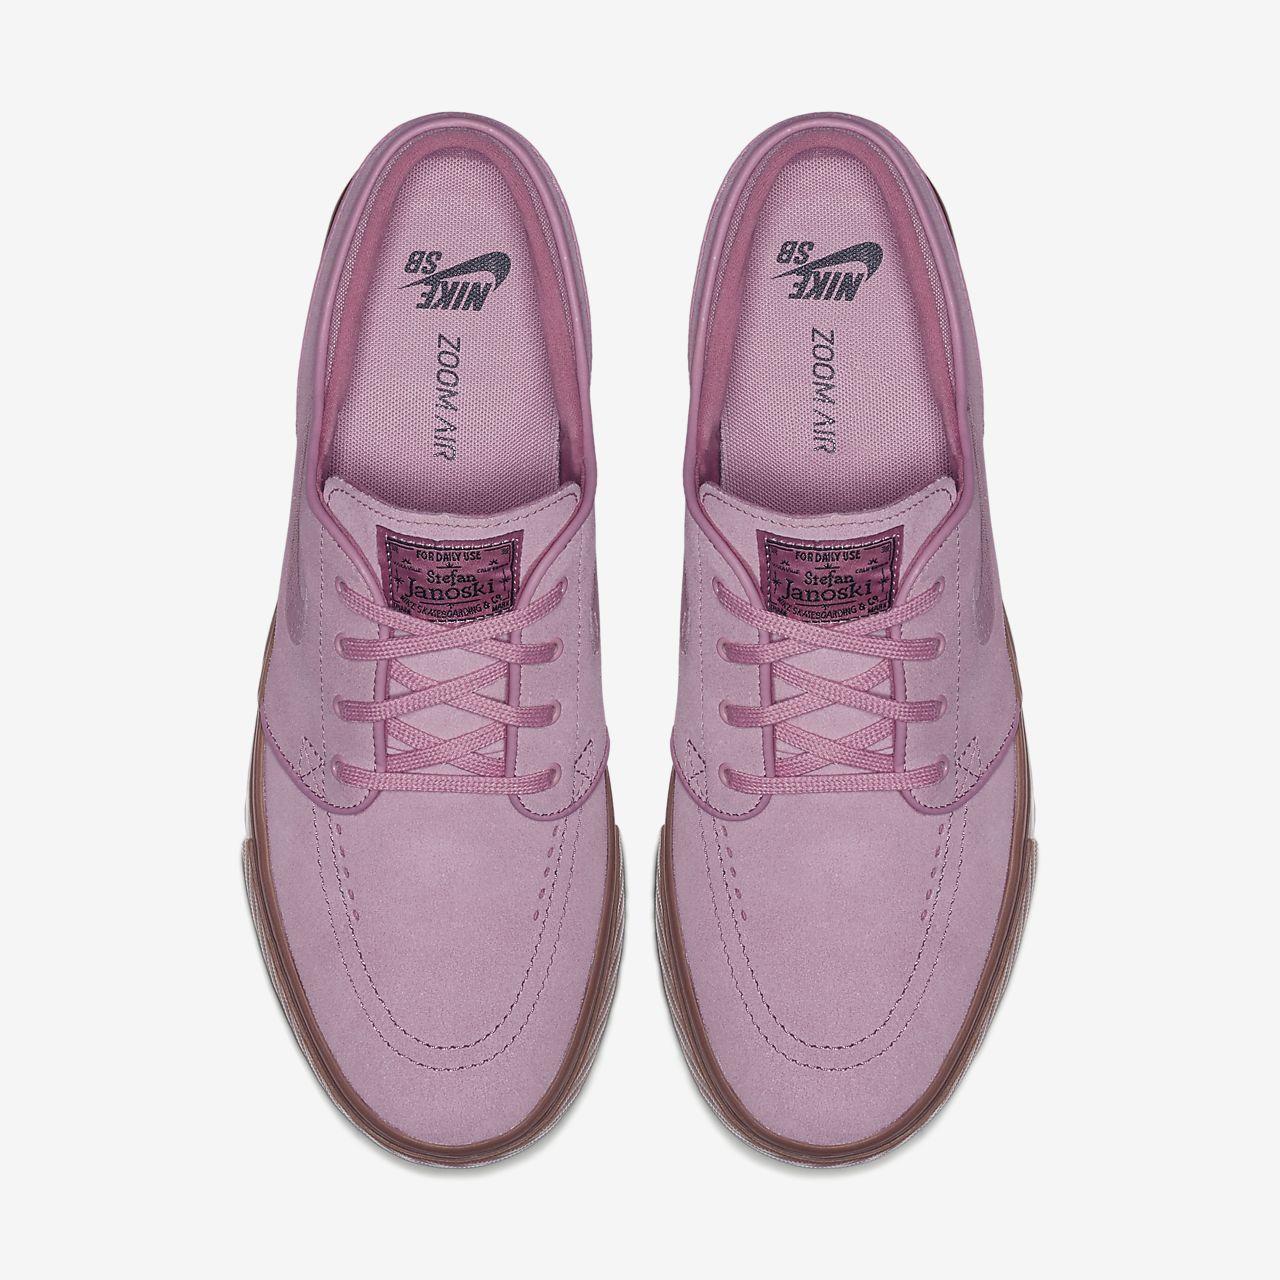 Acquista Nw0o8pk Ciabatte Off60sconti Sb Nike Uomo Rose DH9YIb2eWE